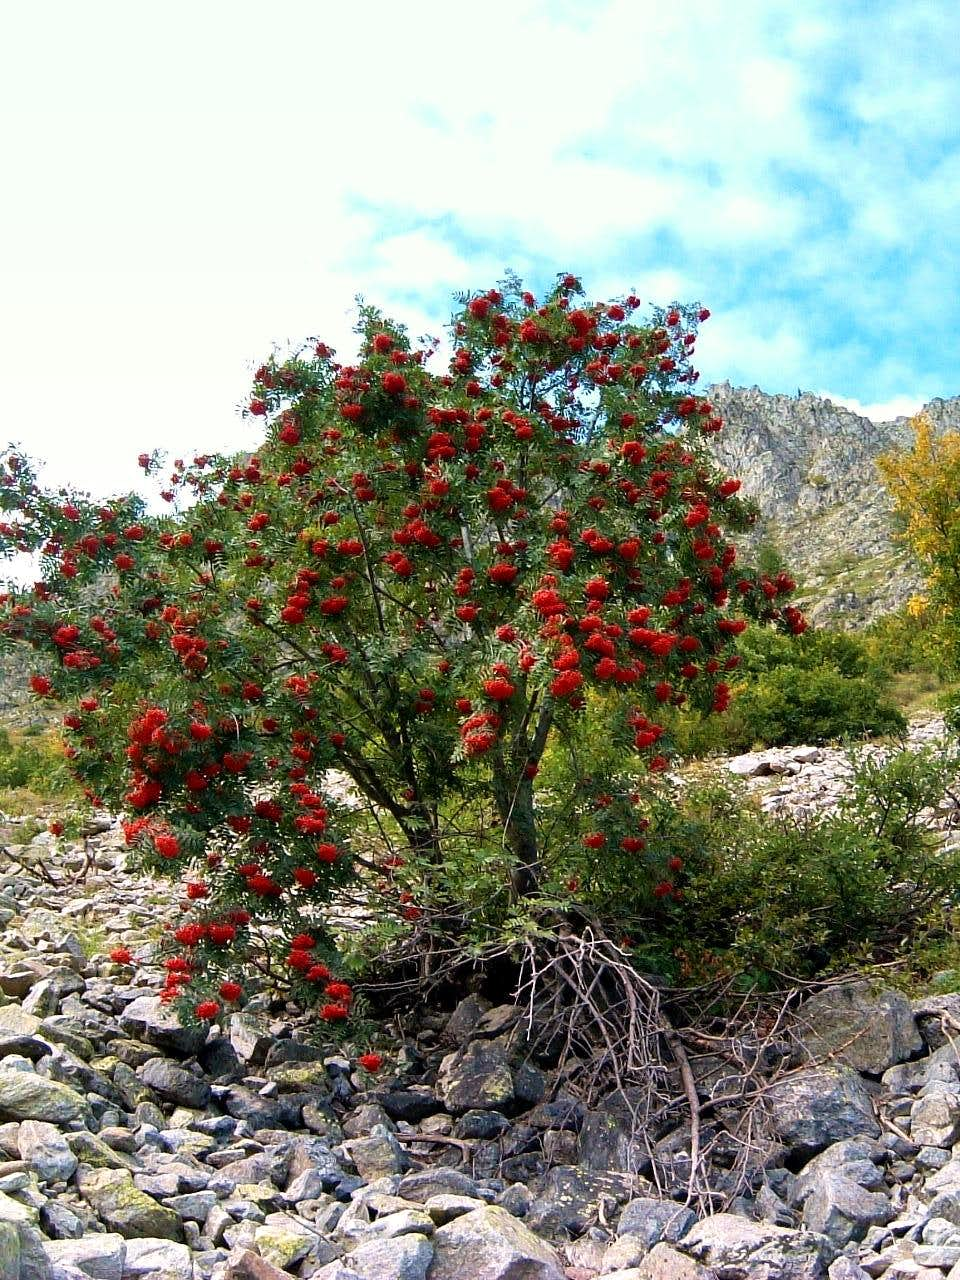 Sorbo degli uccellatori (Sorbus Aucuparia) along the Ischiator Valloon